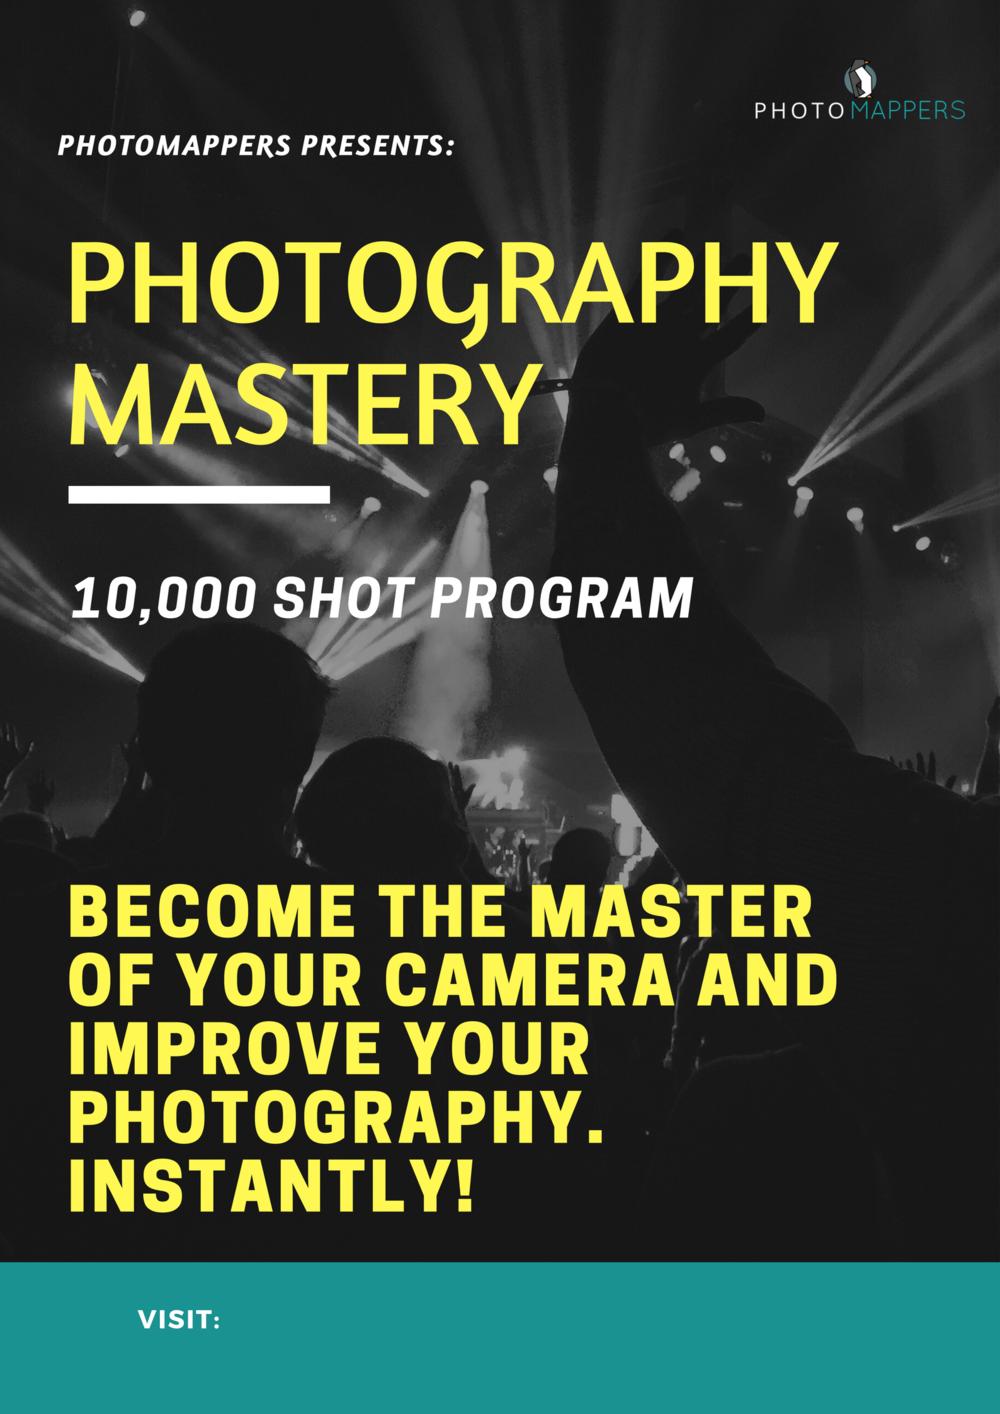 Photography mastery course. 10,000 shot program